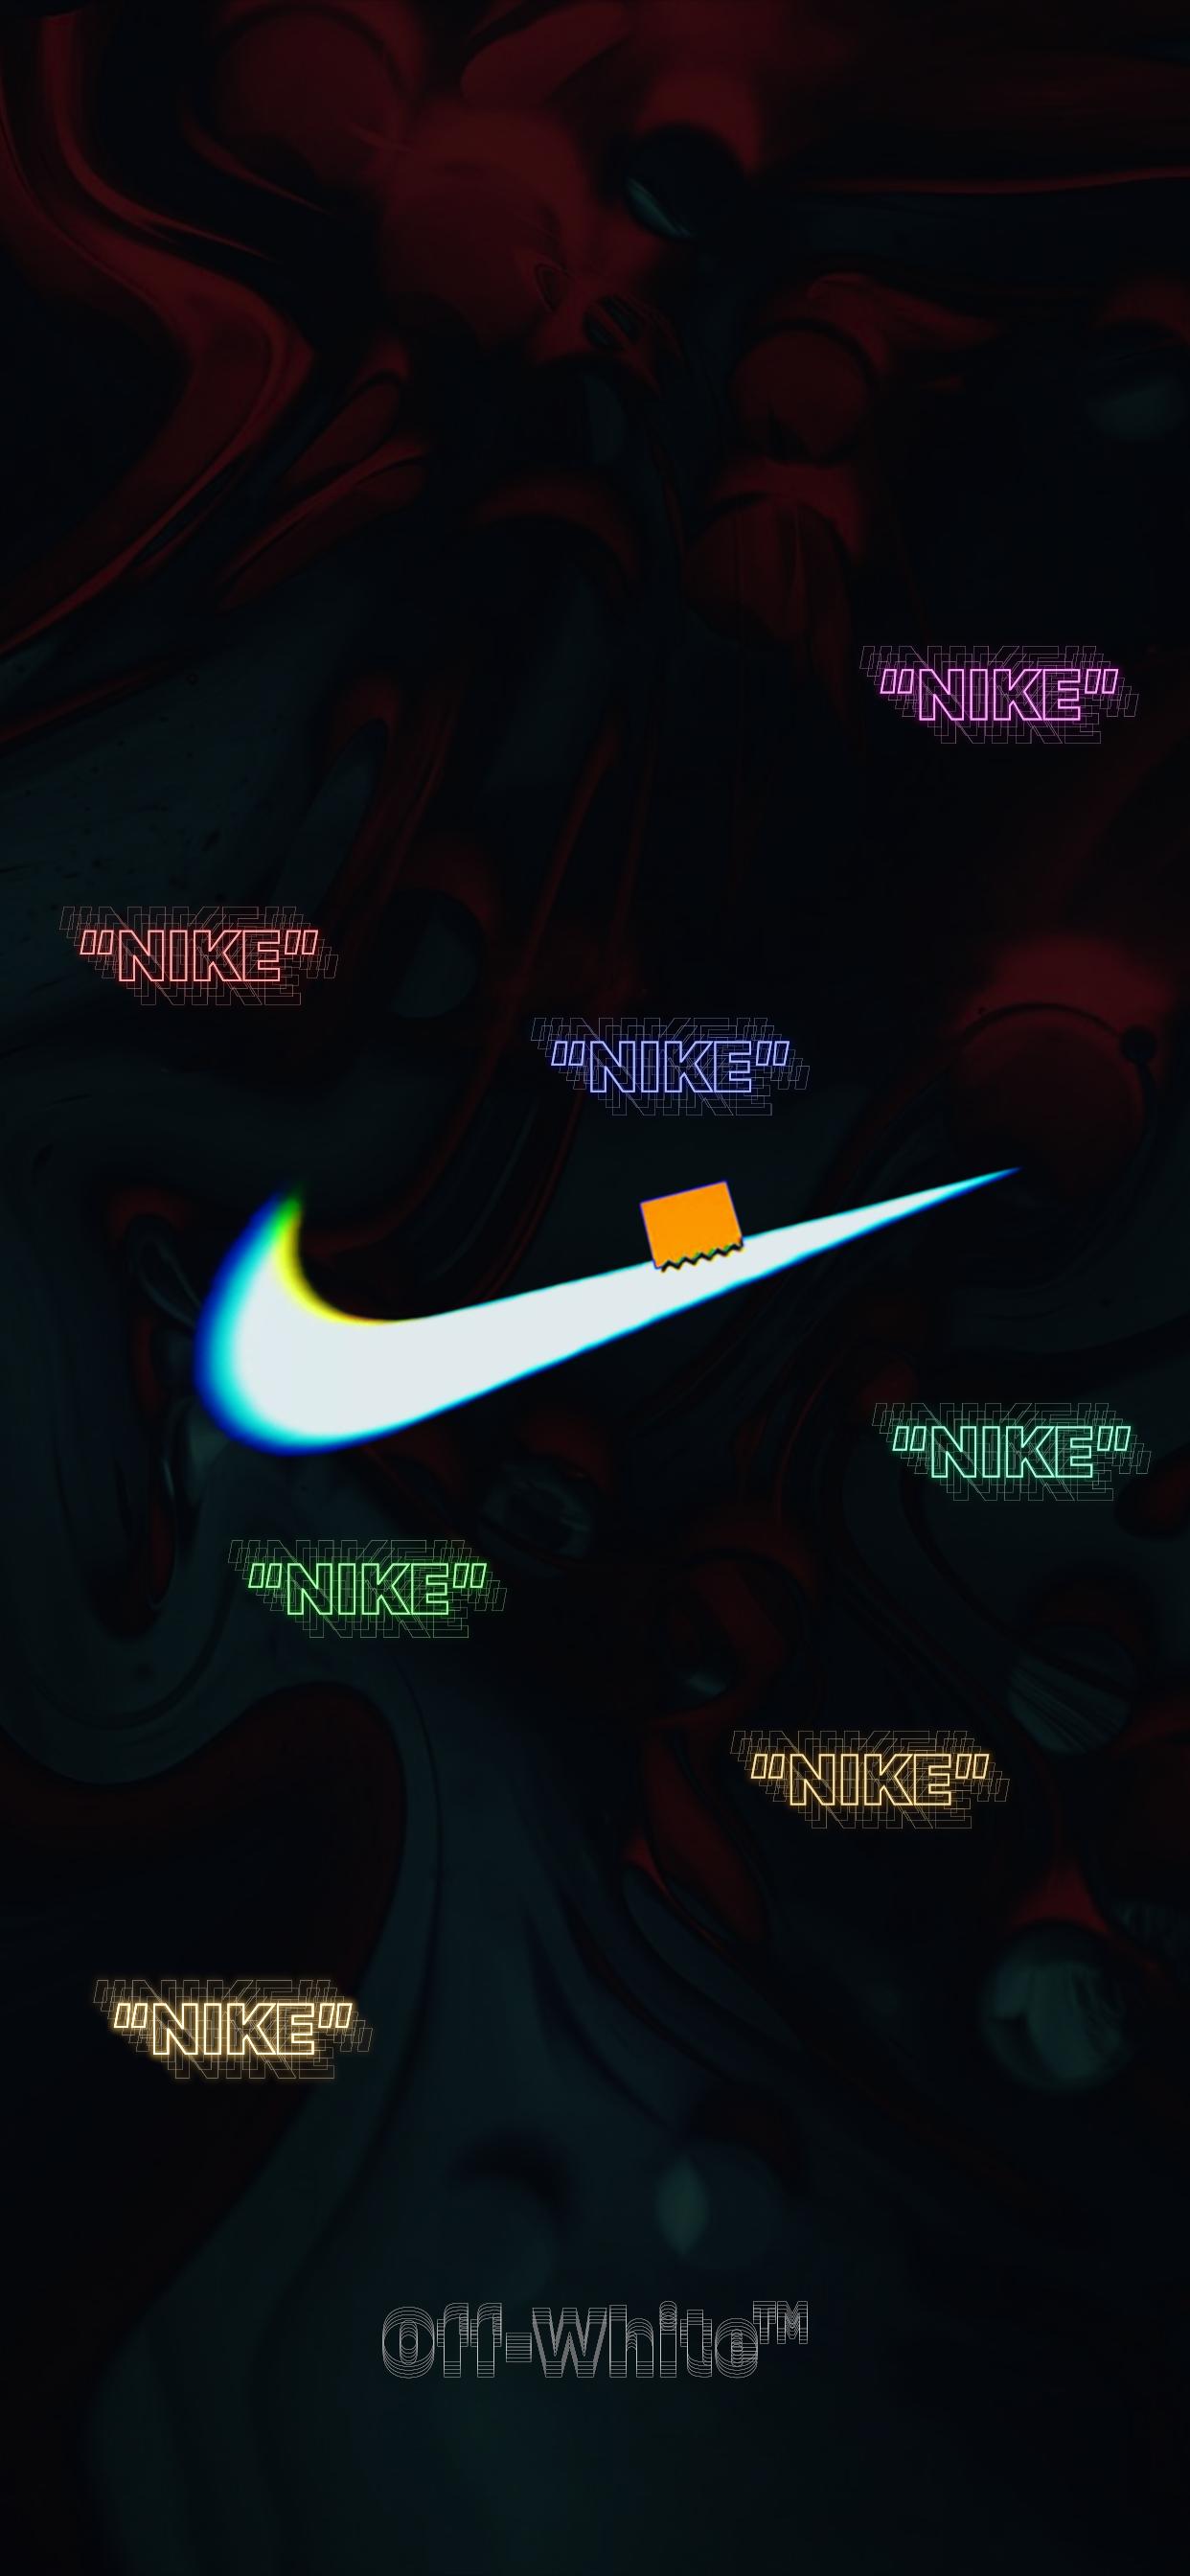 Nike X Offwhite Wallpaper Hypebeast Iphone Wallpaper Bape Wallpaper Iphone Iphone Wallpaper Tumblr Aesthetic